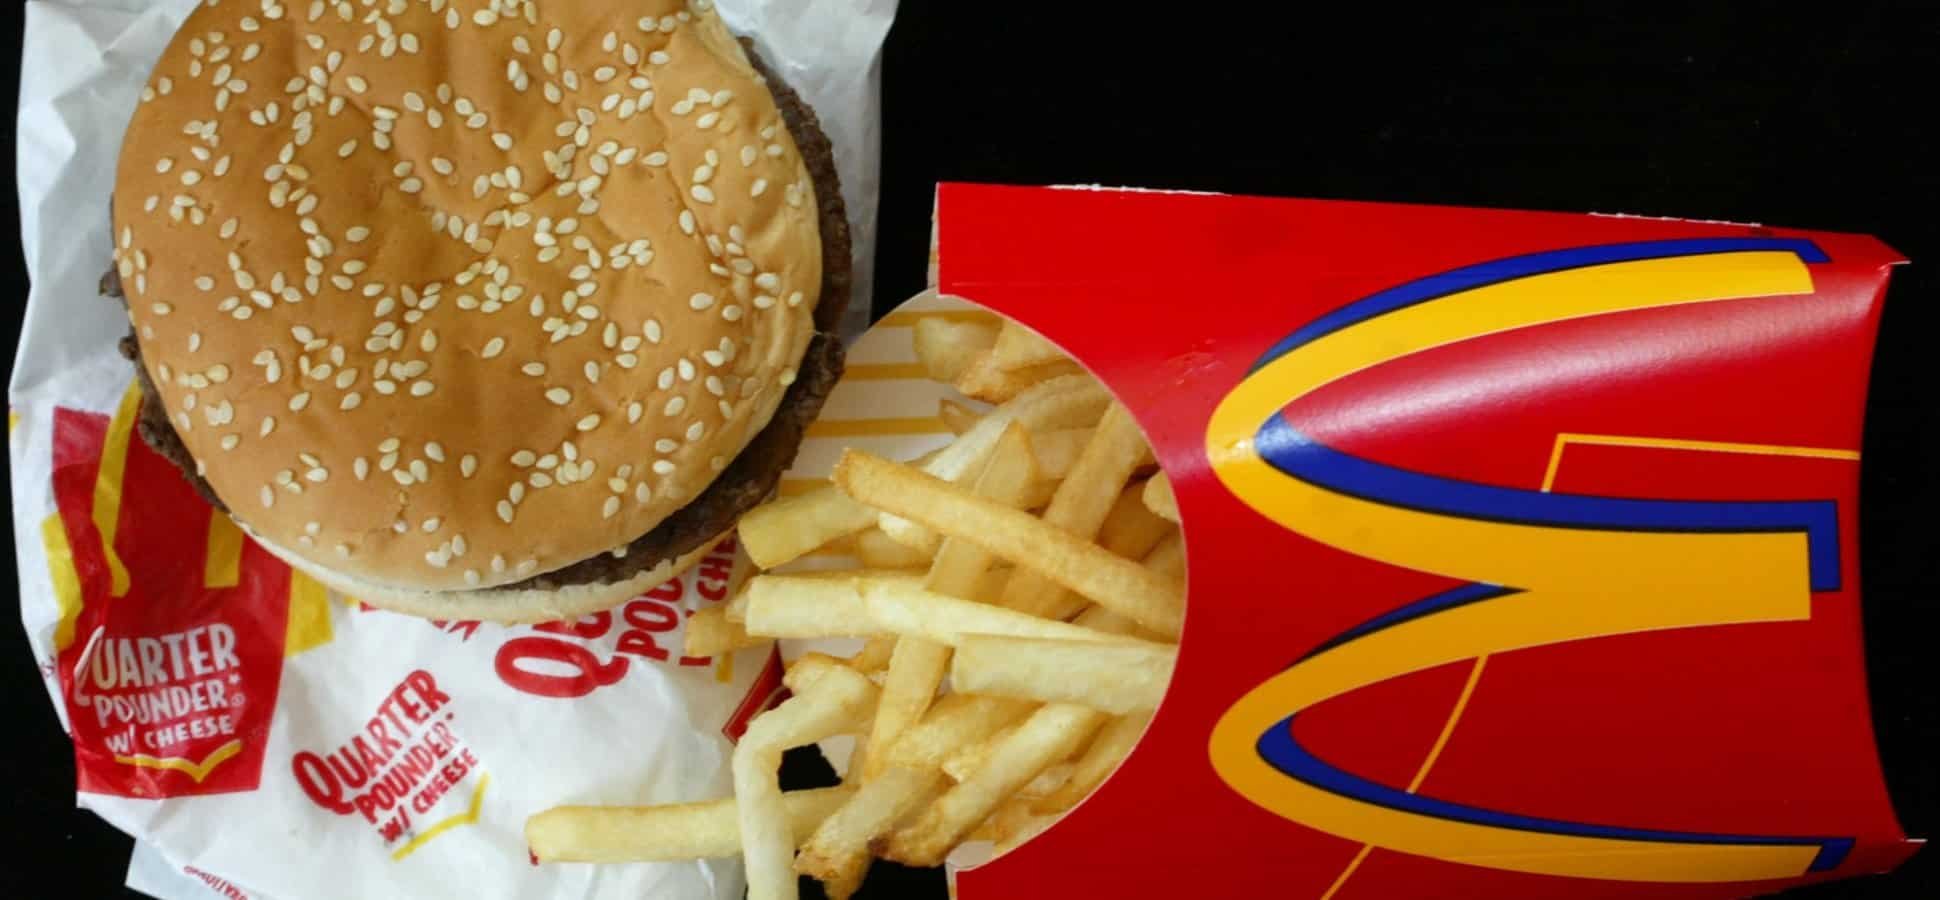 McDonald's Black Friday Marketing: Epic Fail or Nifty Strategy? - The Executive Hub